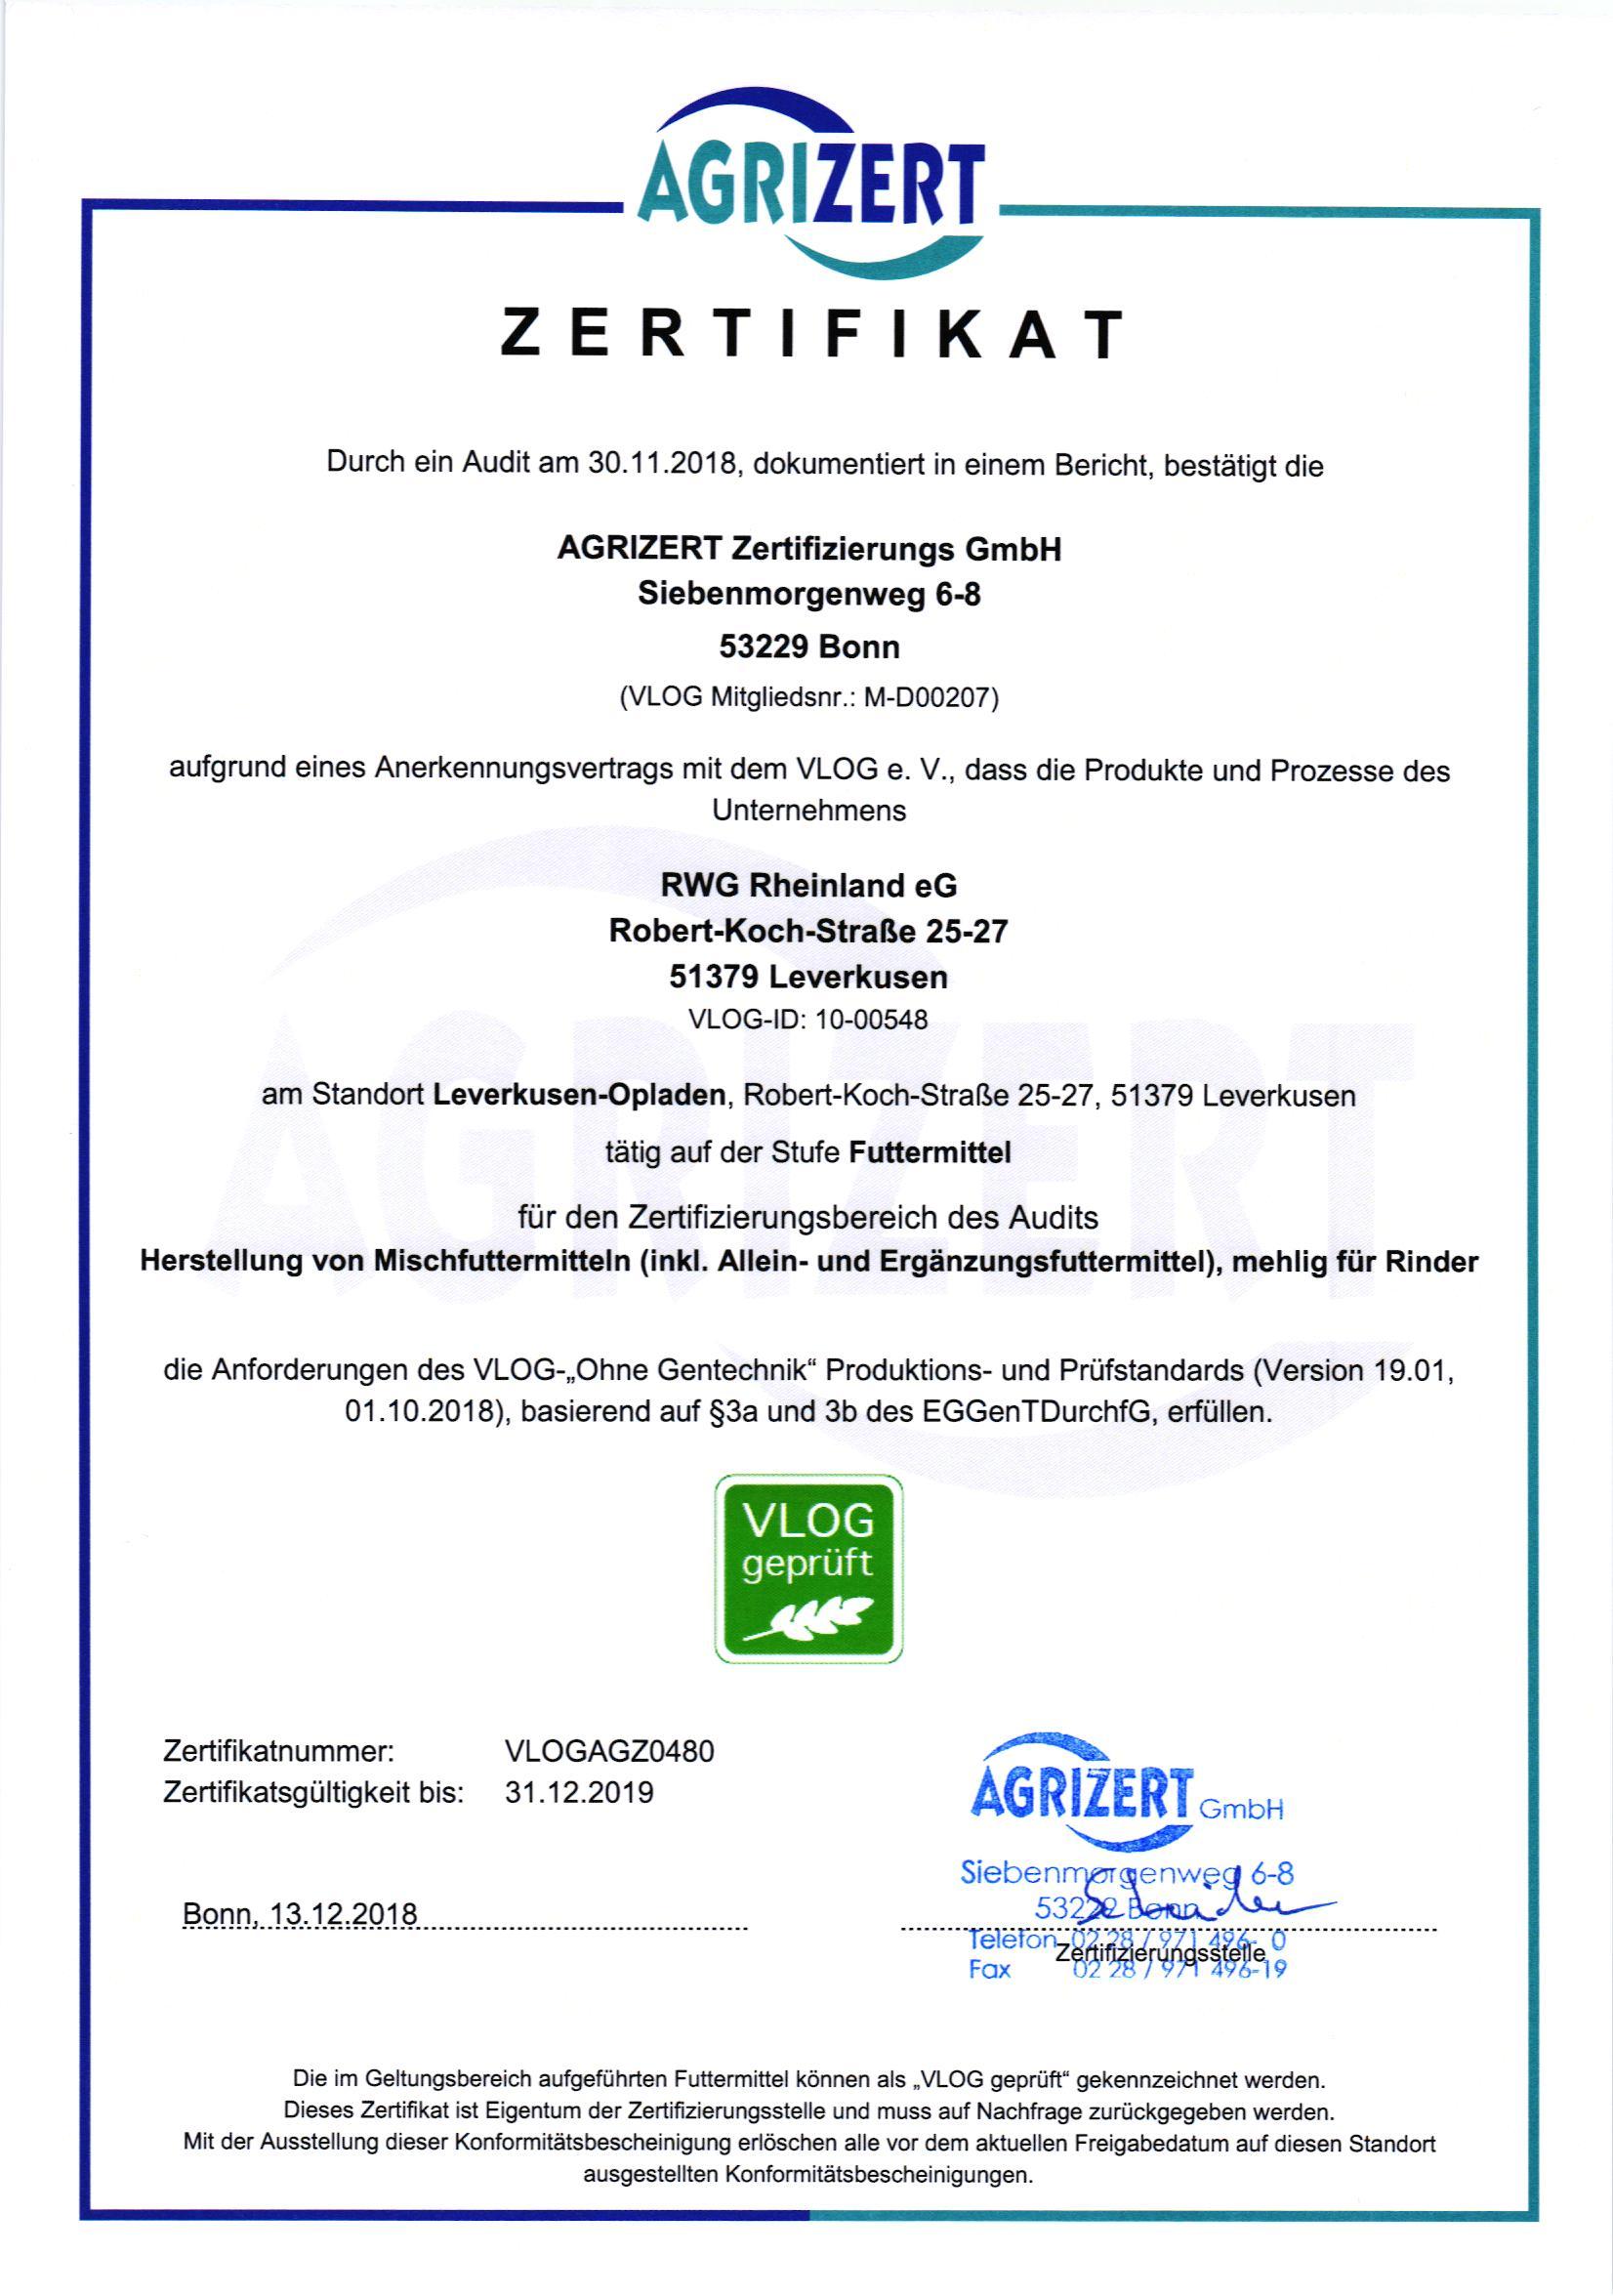 QM/2018_Zertifikat_VLOG_AGZ0480.jpg